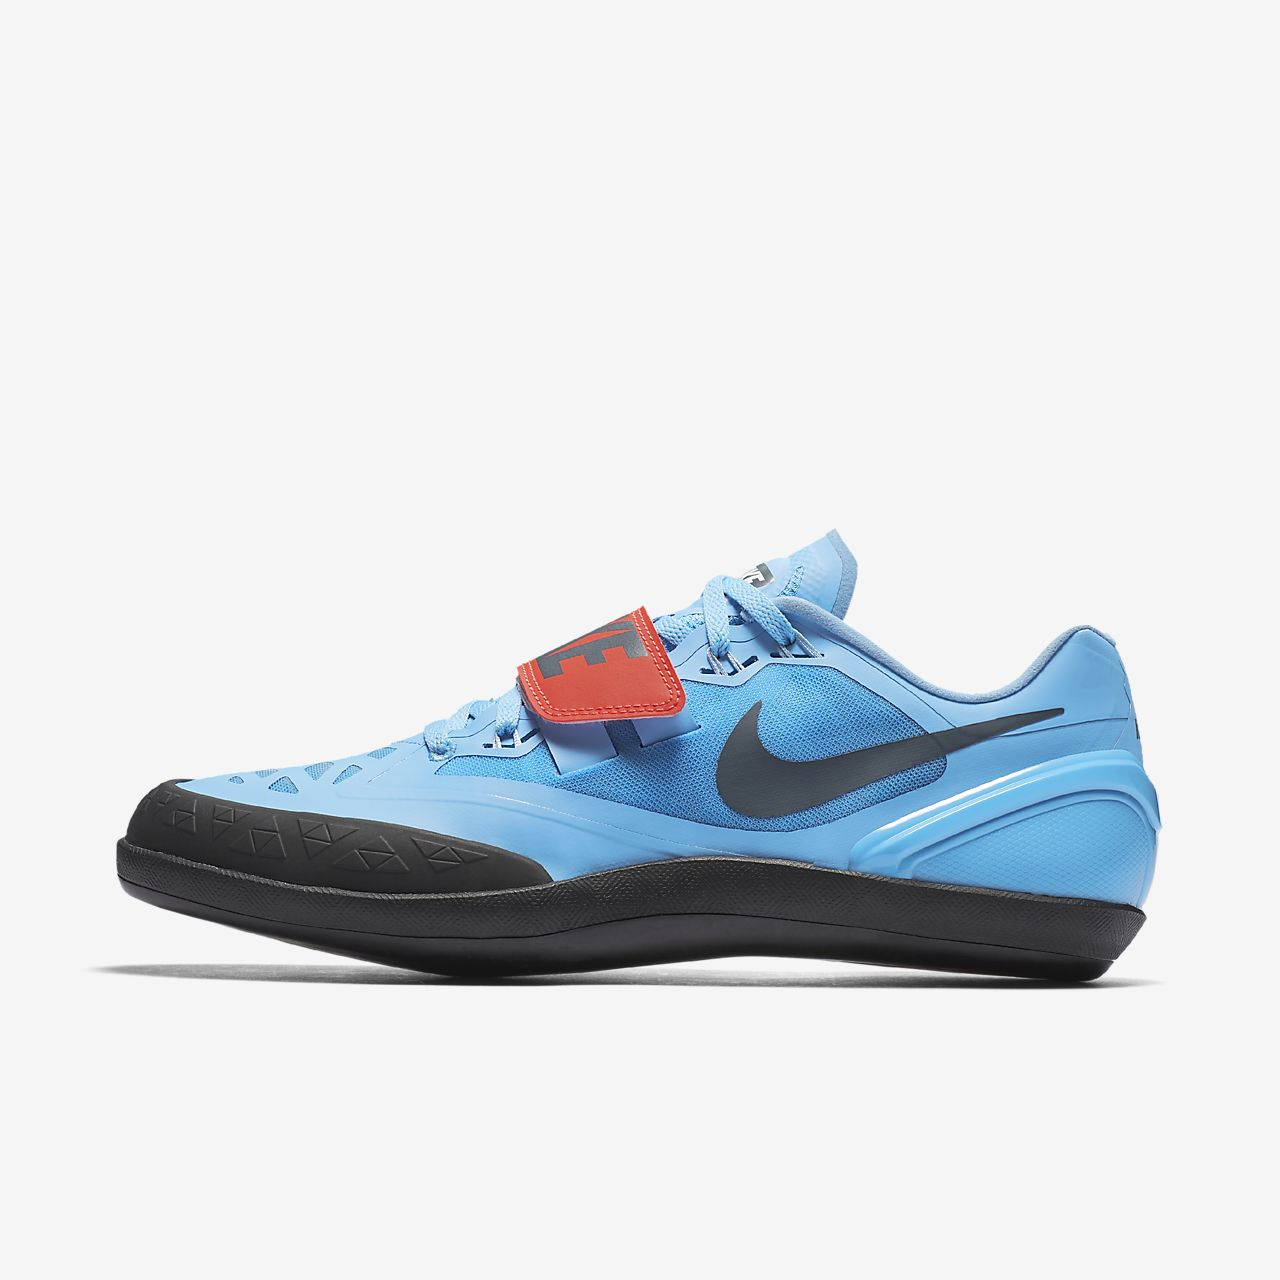 ... Nike Zoom Rotational 6 Unisex Throwing Shoe